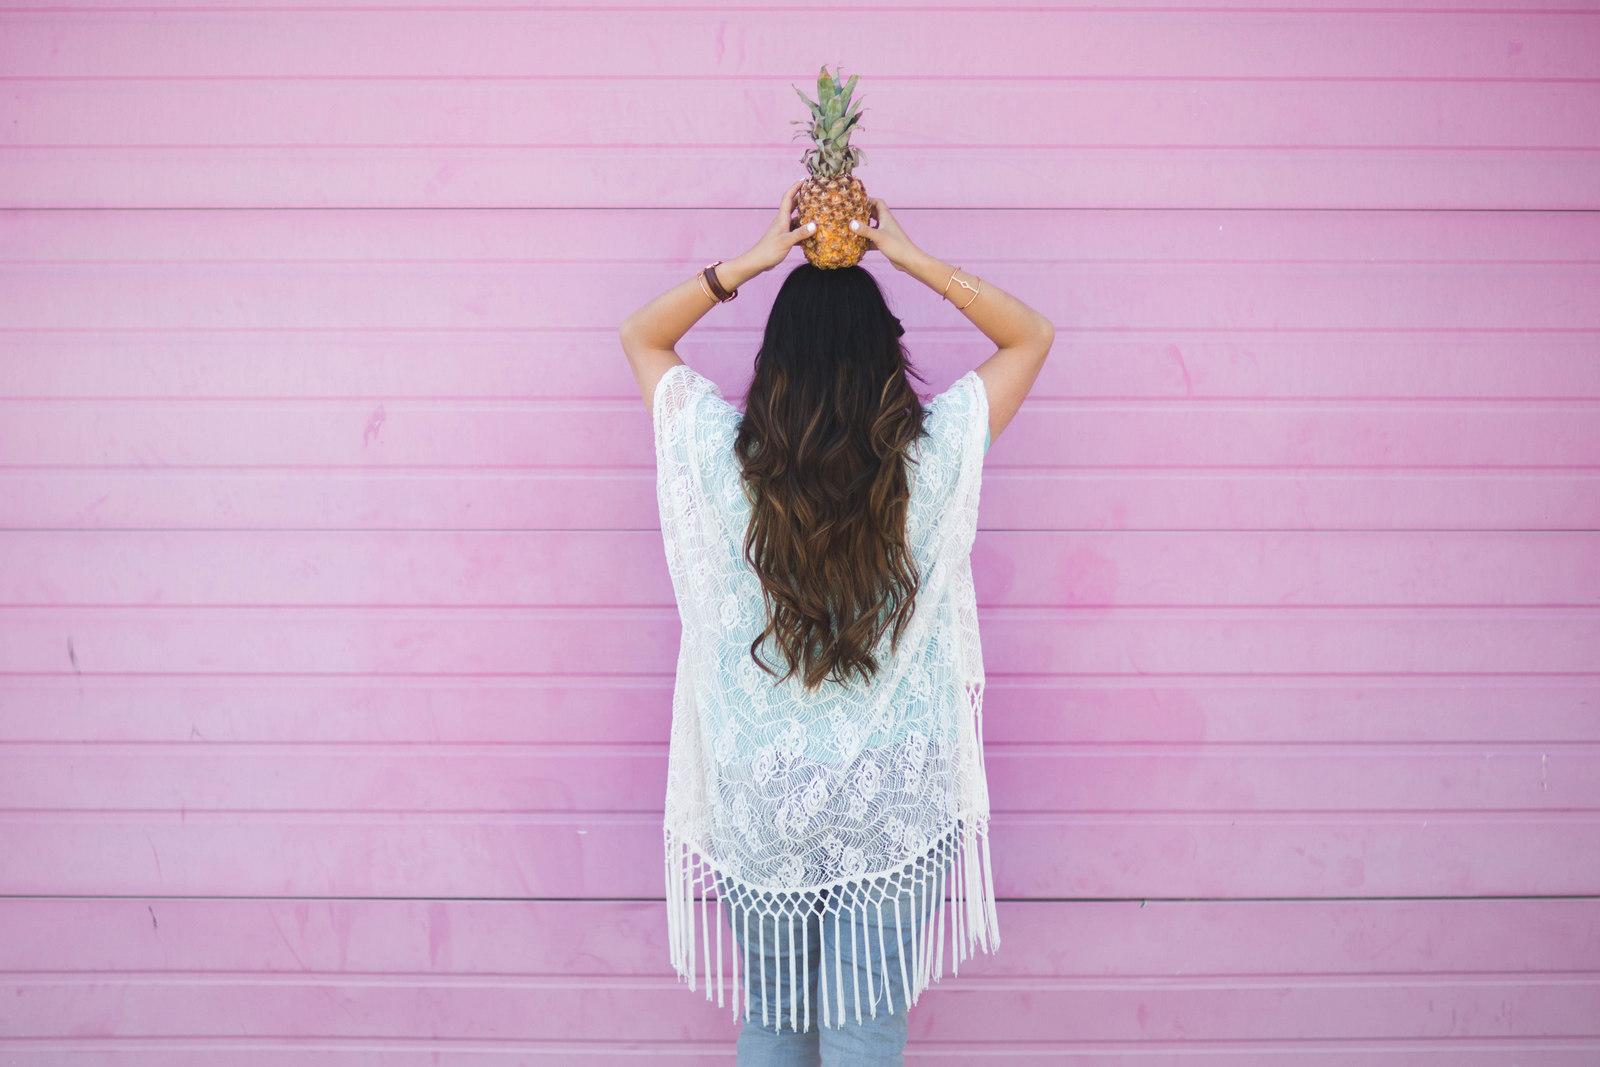 Sandy a la Mode | Fashion Blogger Boho Look with Pineapple